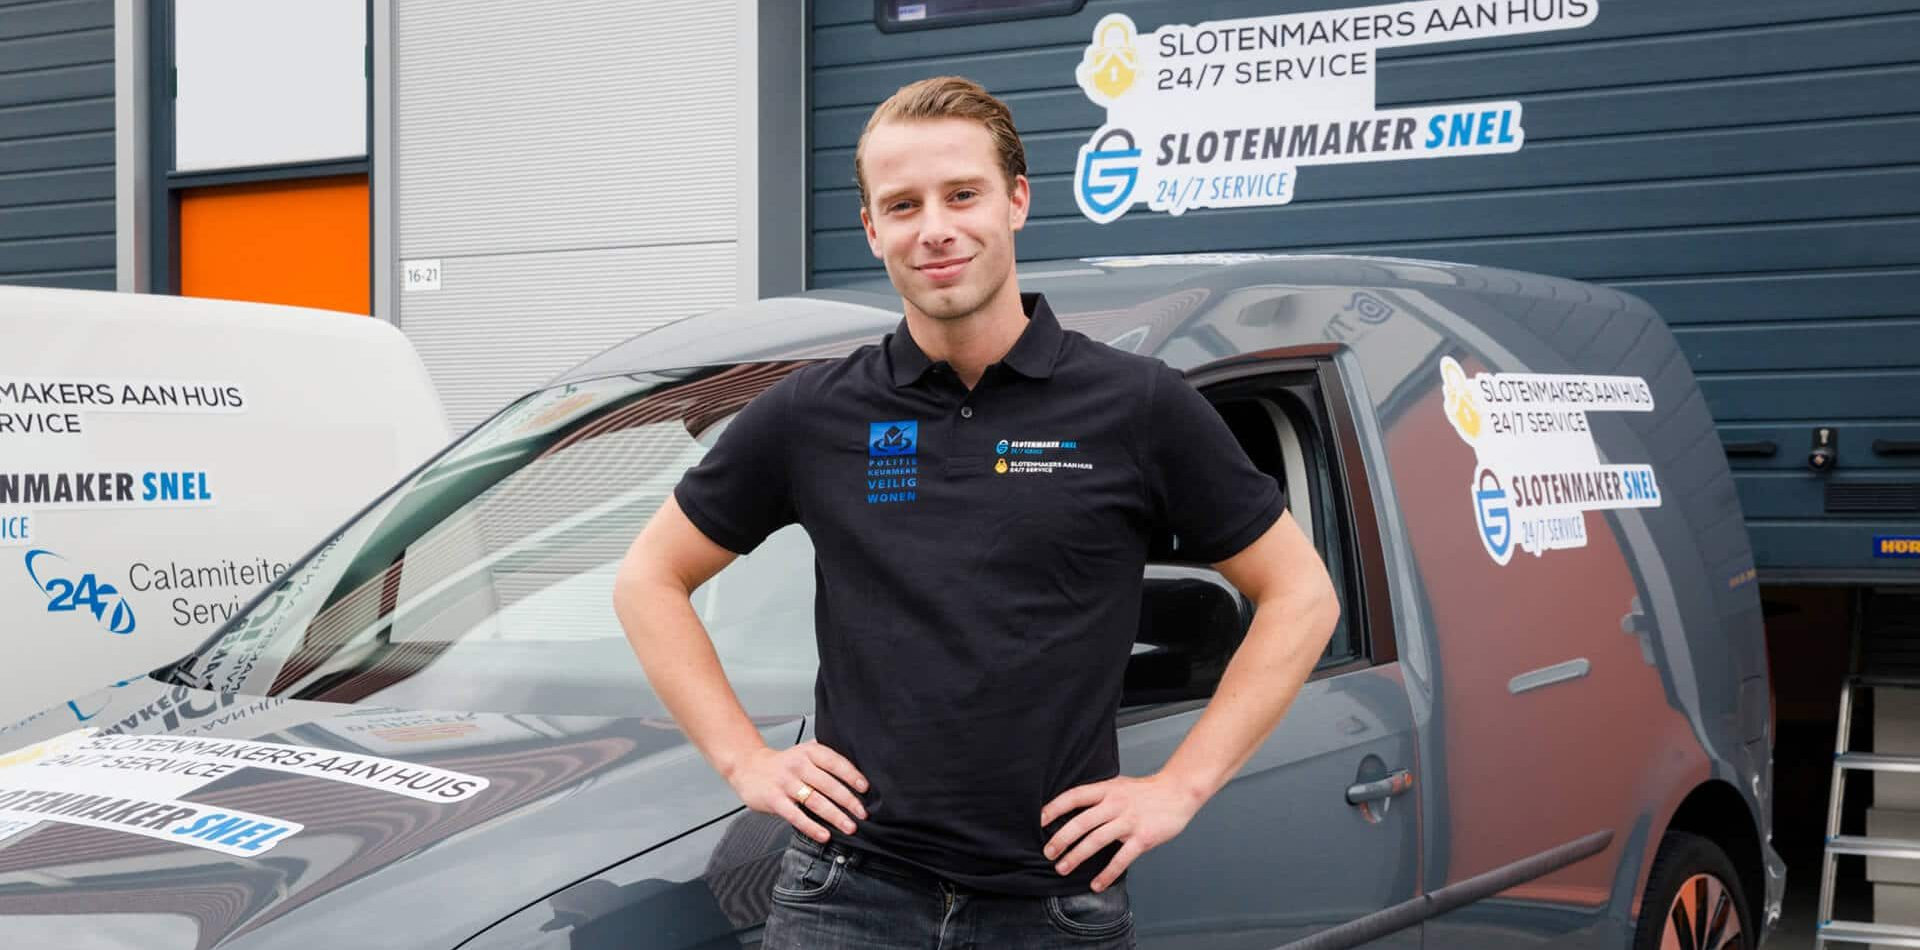 Slotenmaker Loosdrecht